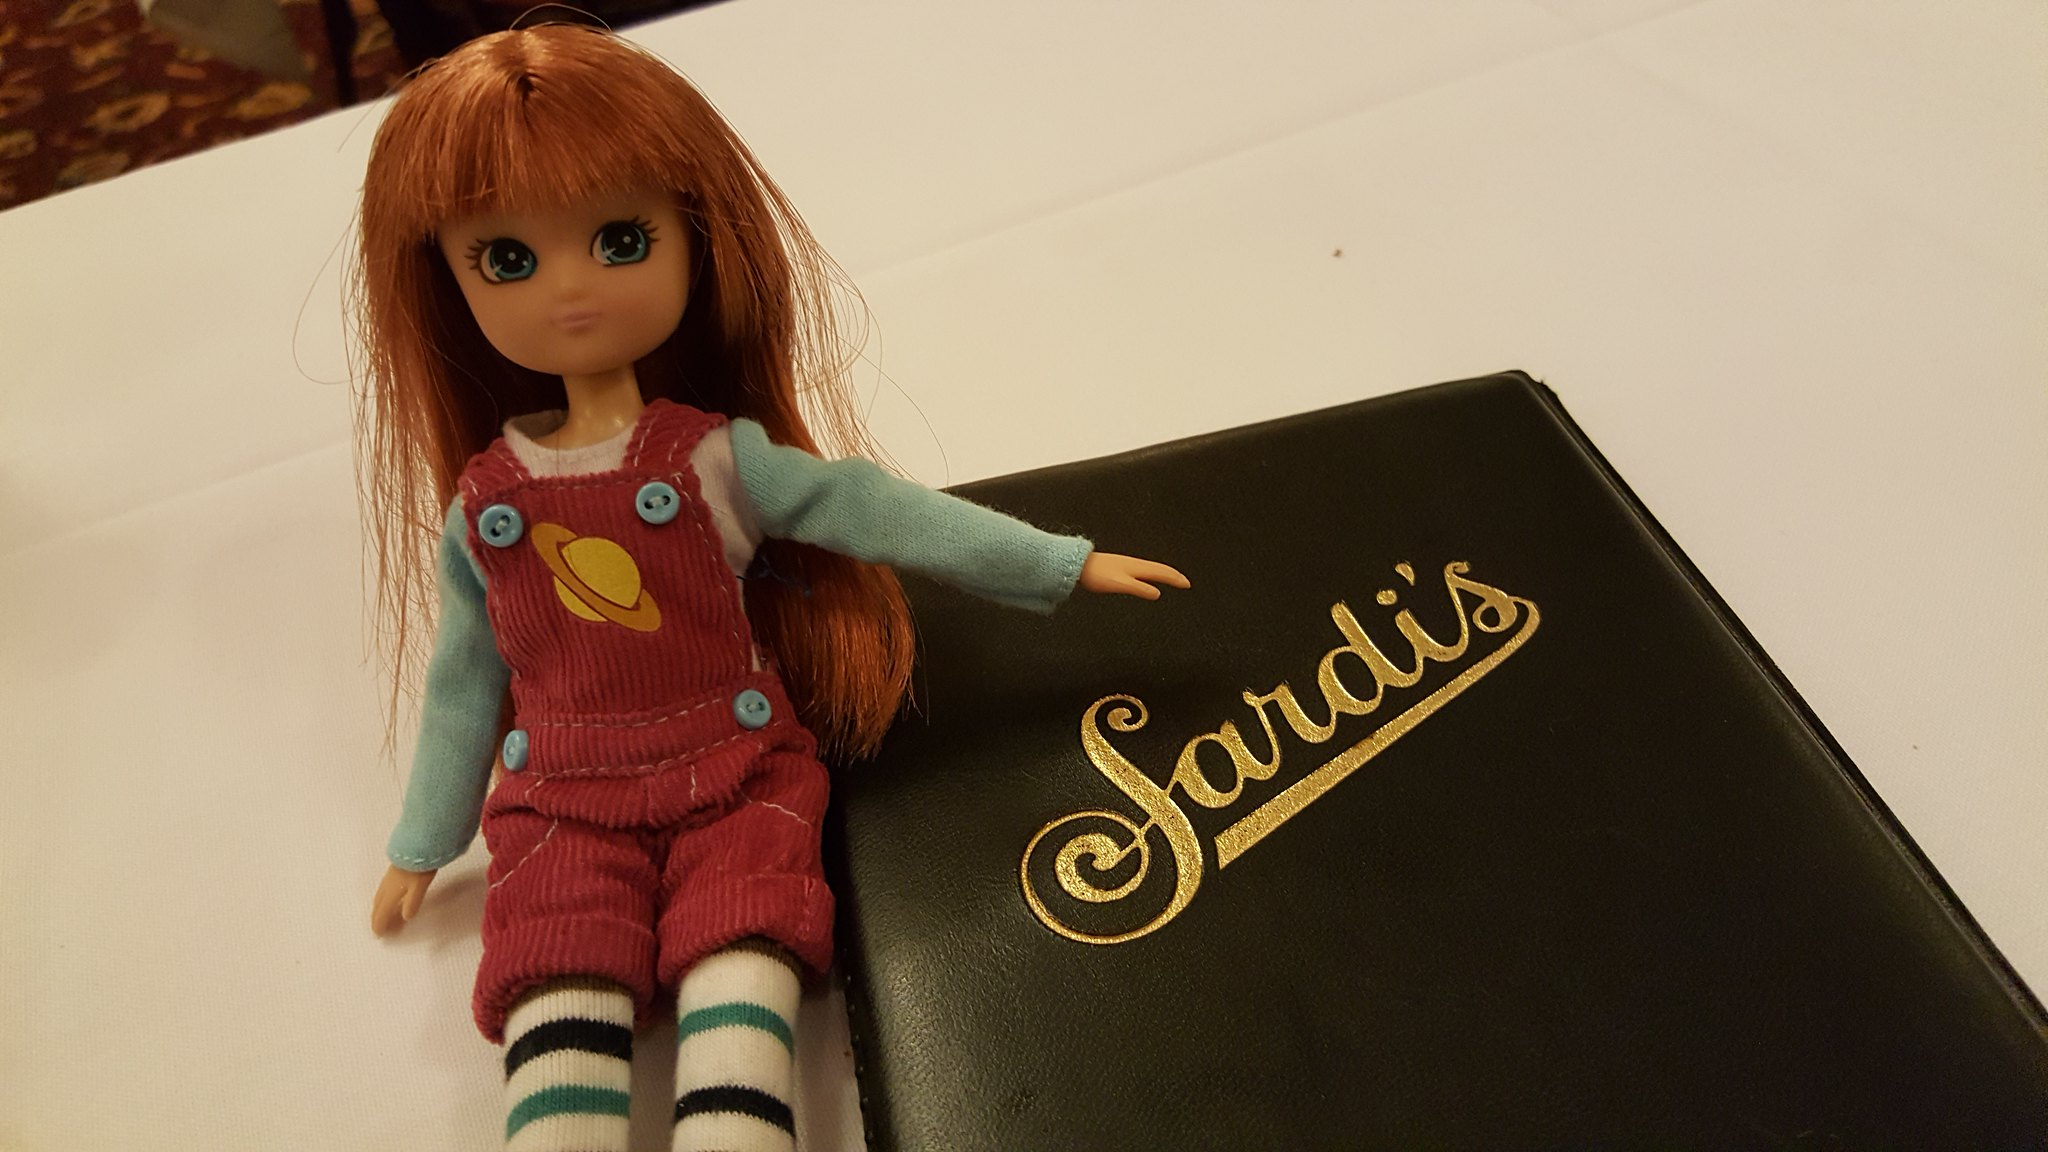 Lottie in Sardi's